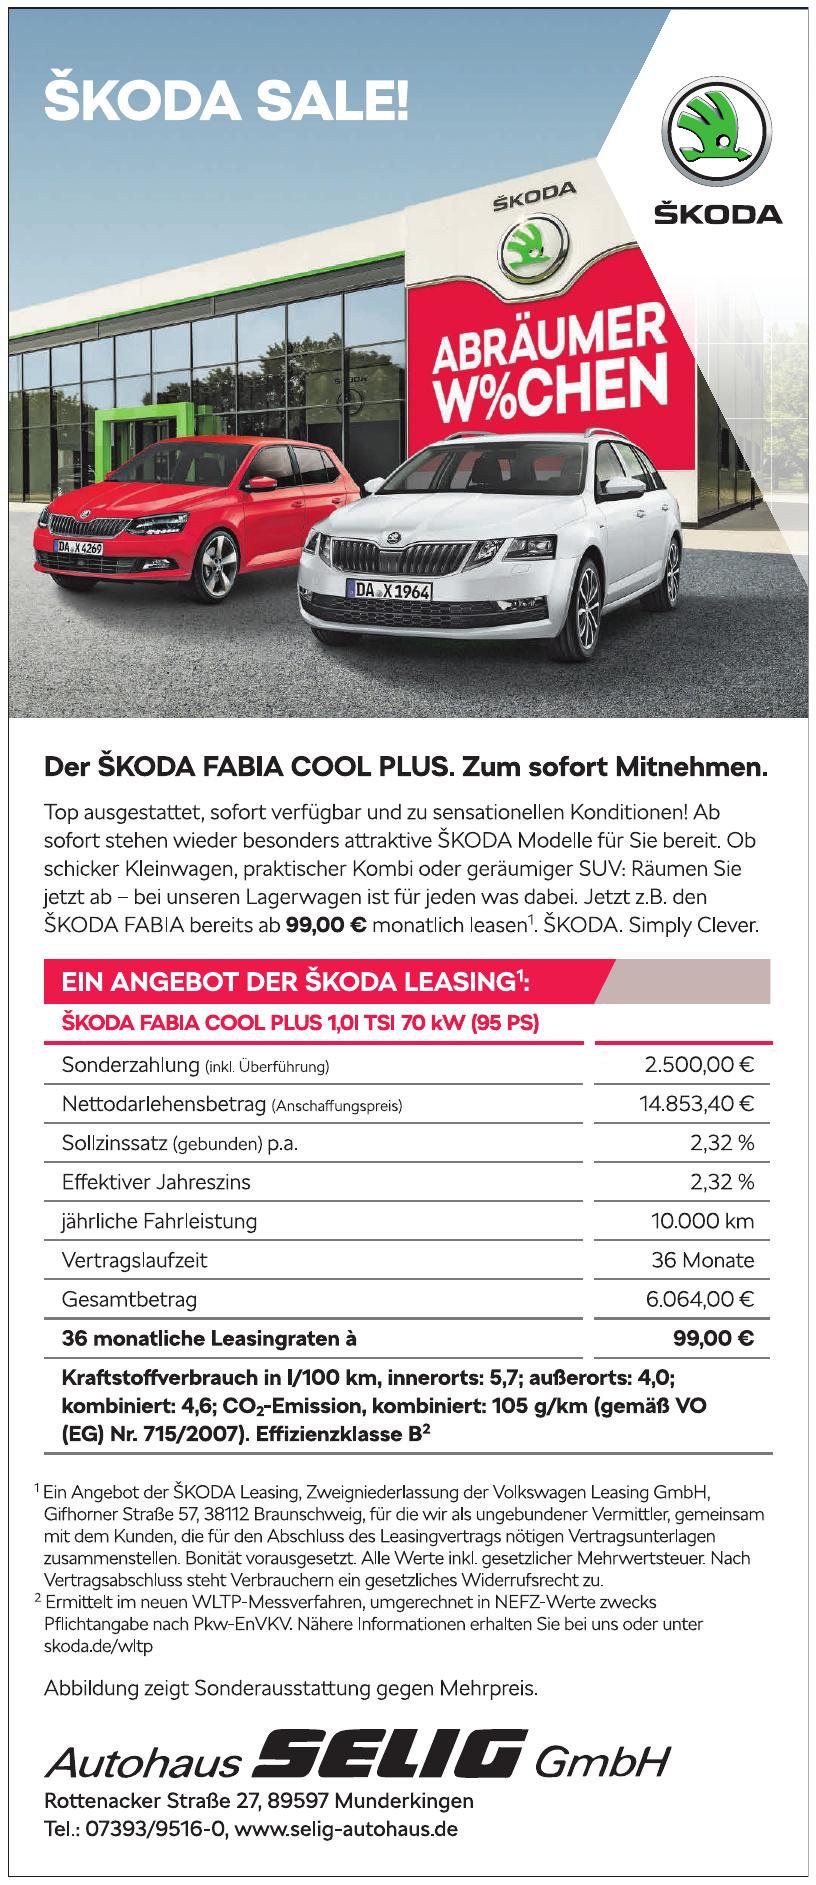 Autohaus Selig GmbH